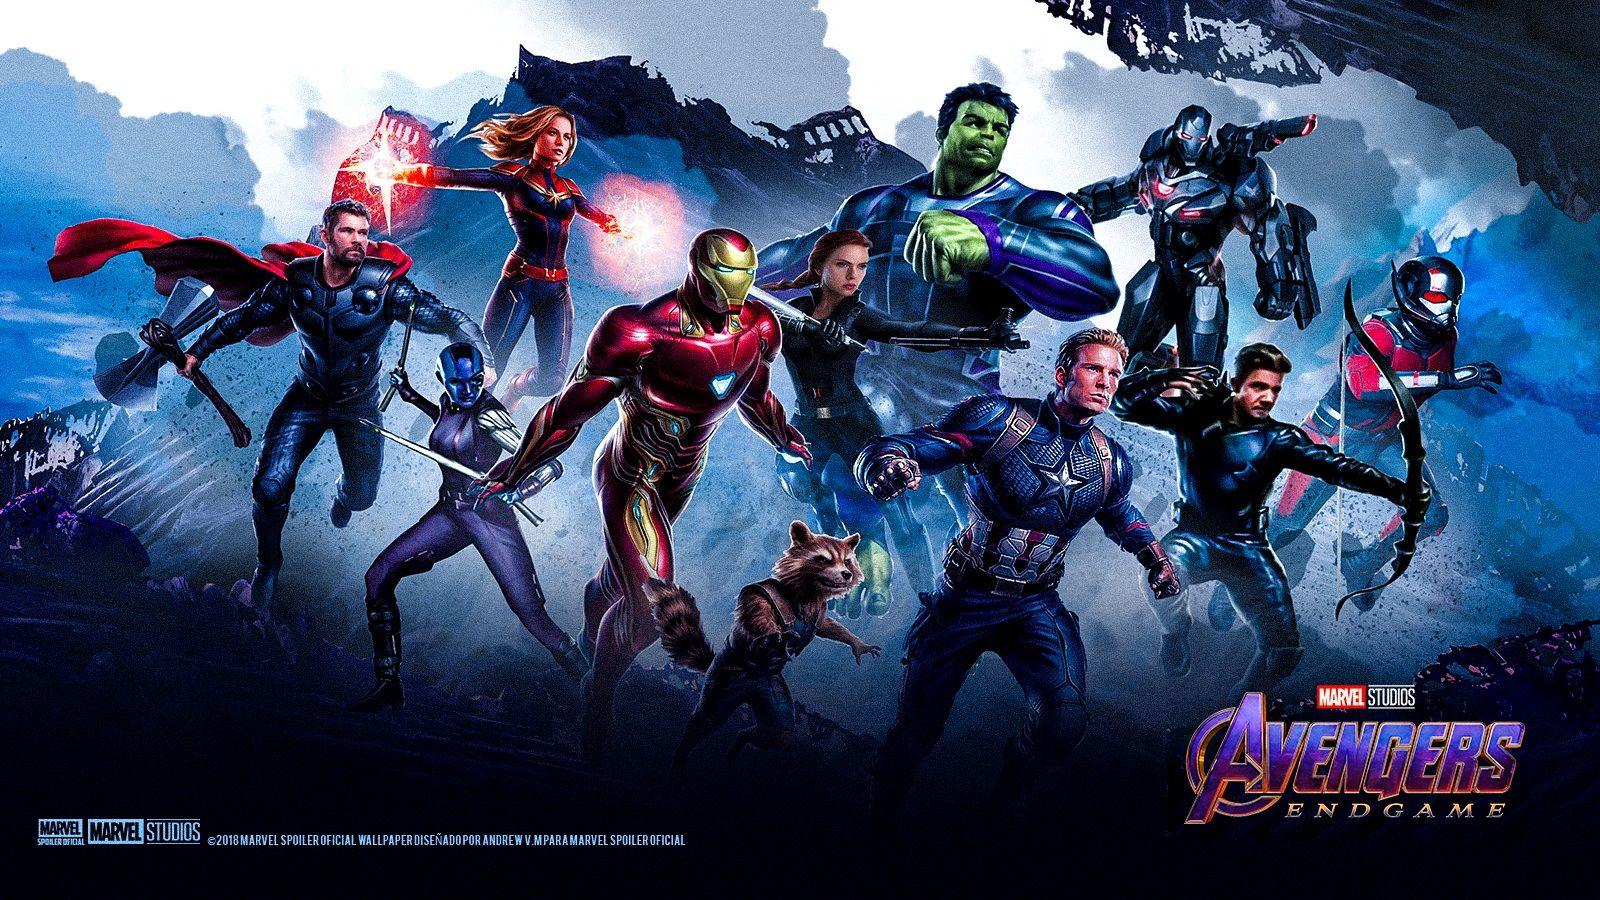 10 Best Avengers Endgame Wallpaper Hd Visual Arts Ideas Best Avenger Avengers Avengers Wallpaper